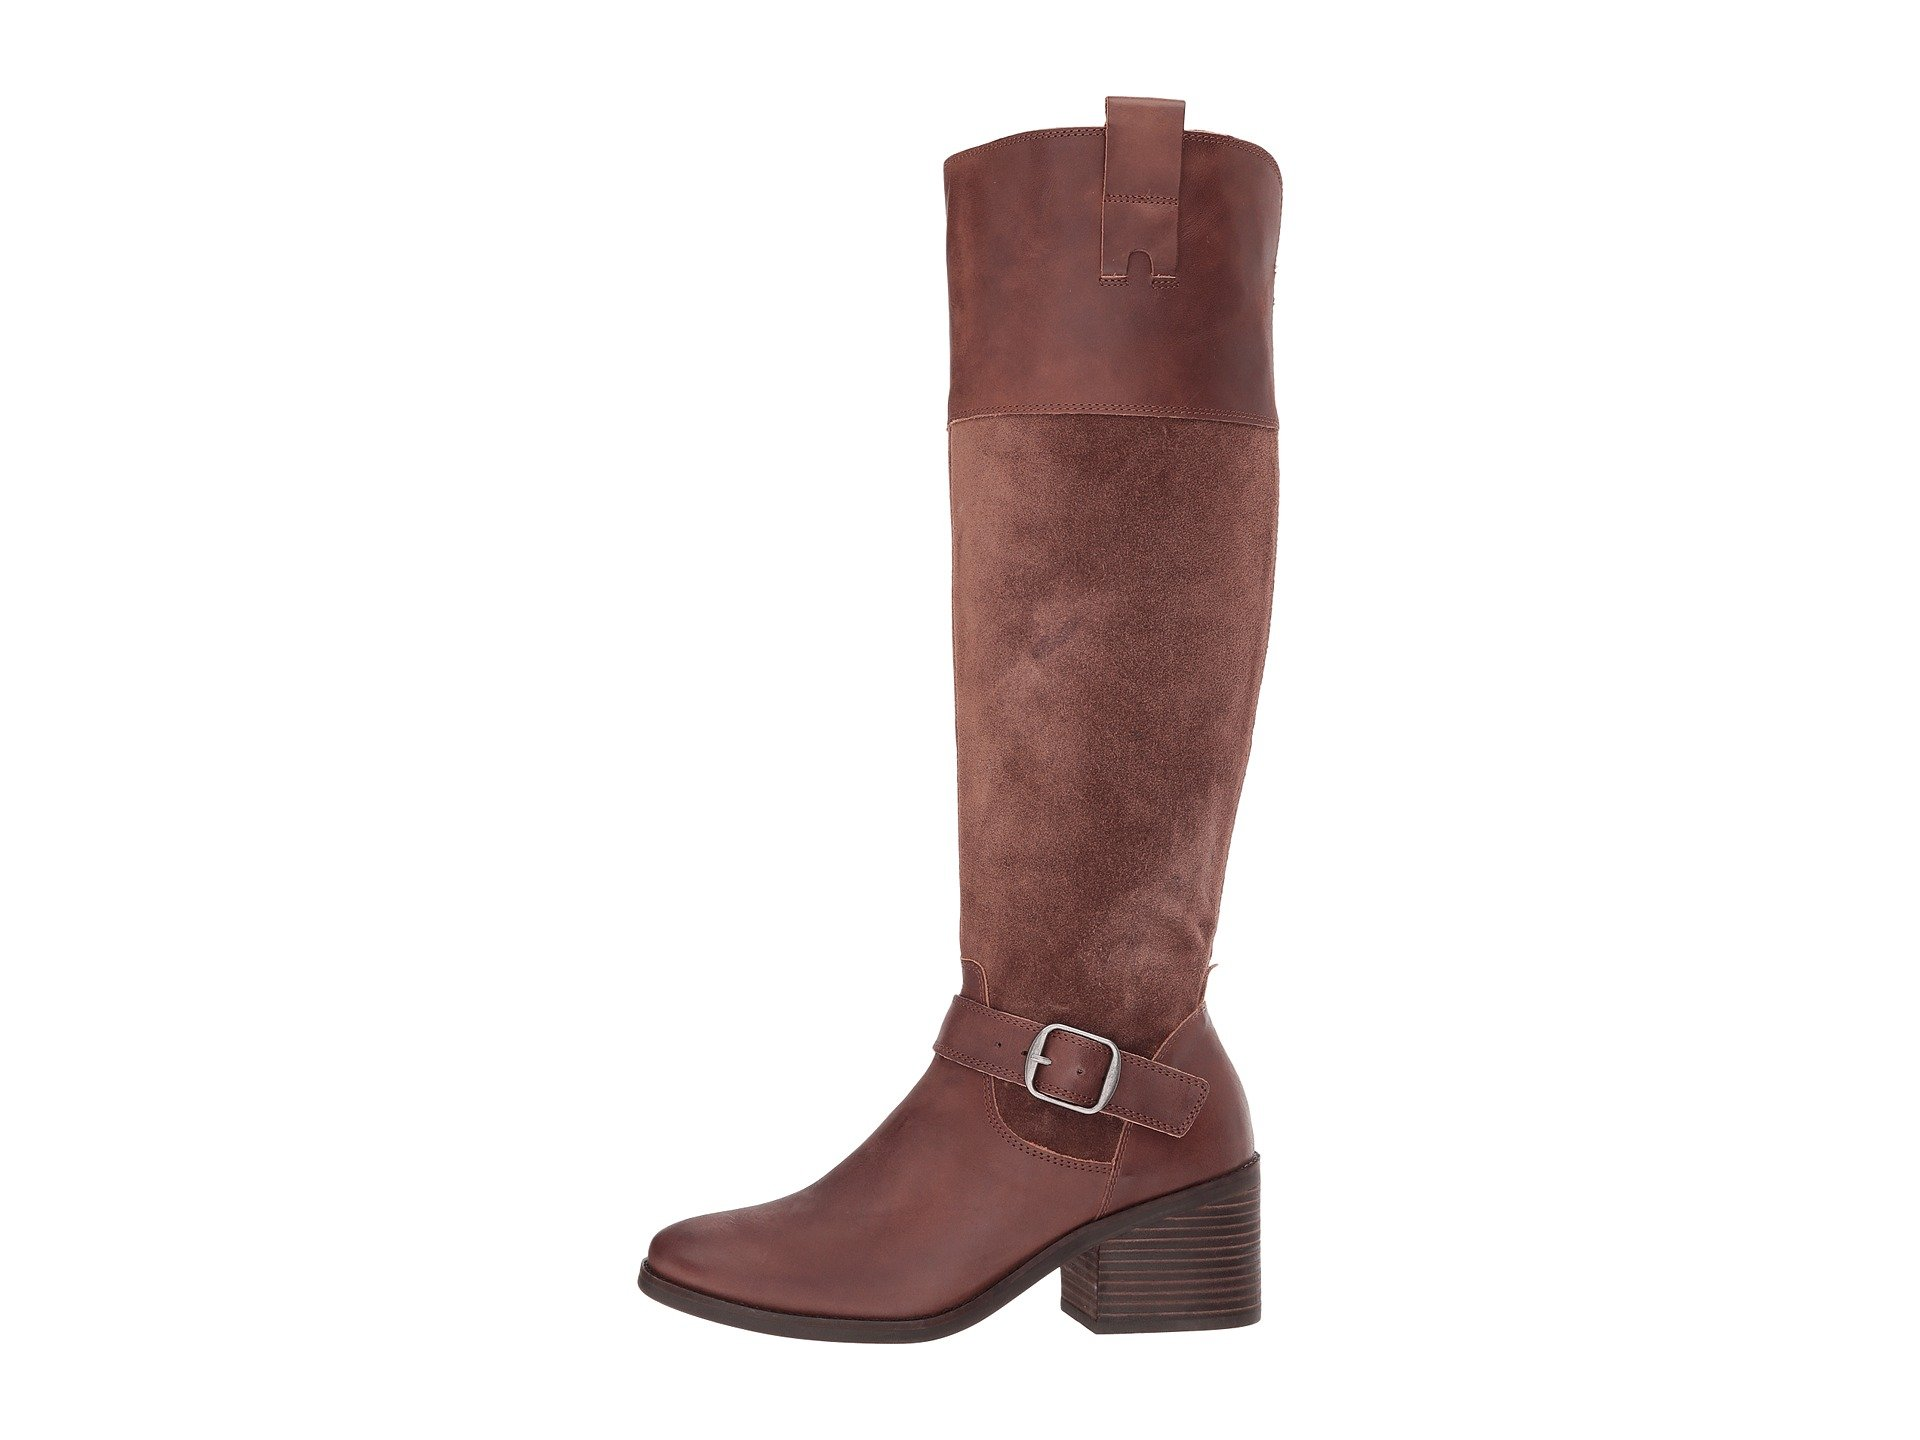 Lucky Women's LK-KAILAN Equestrian Boot (WIDE CALF) CALF) CALF) TOBACCO 6b0675